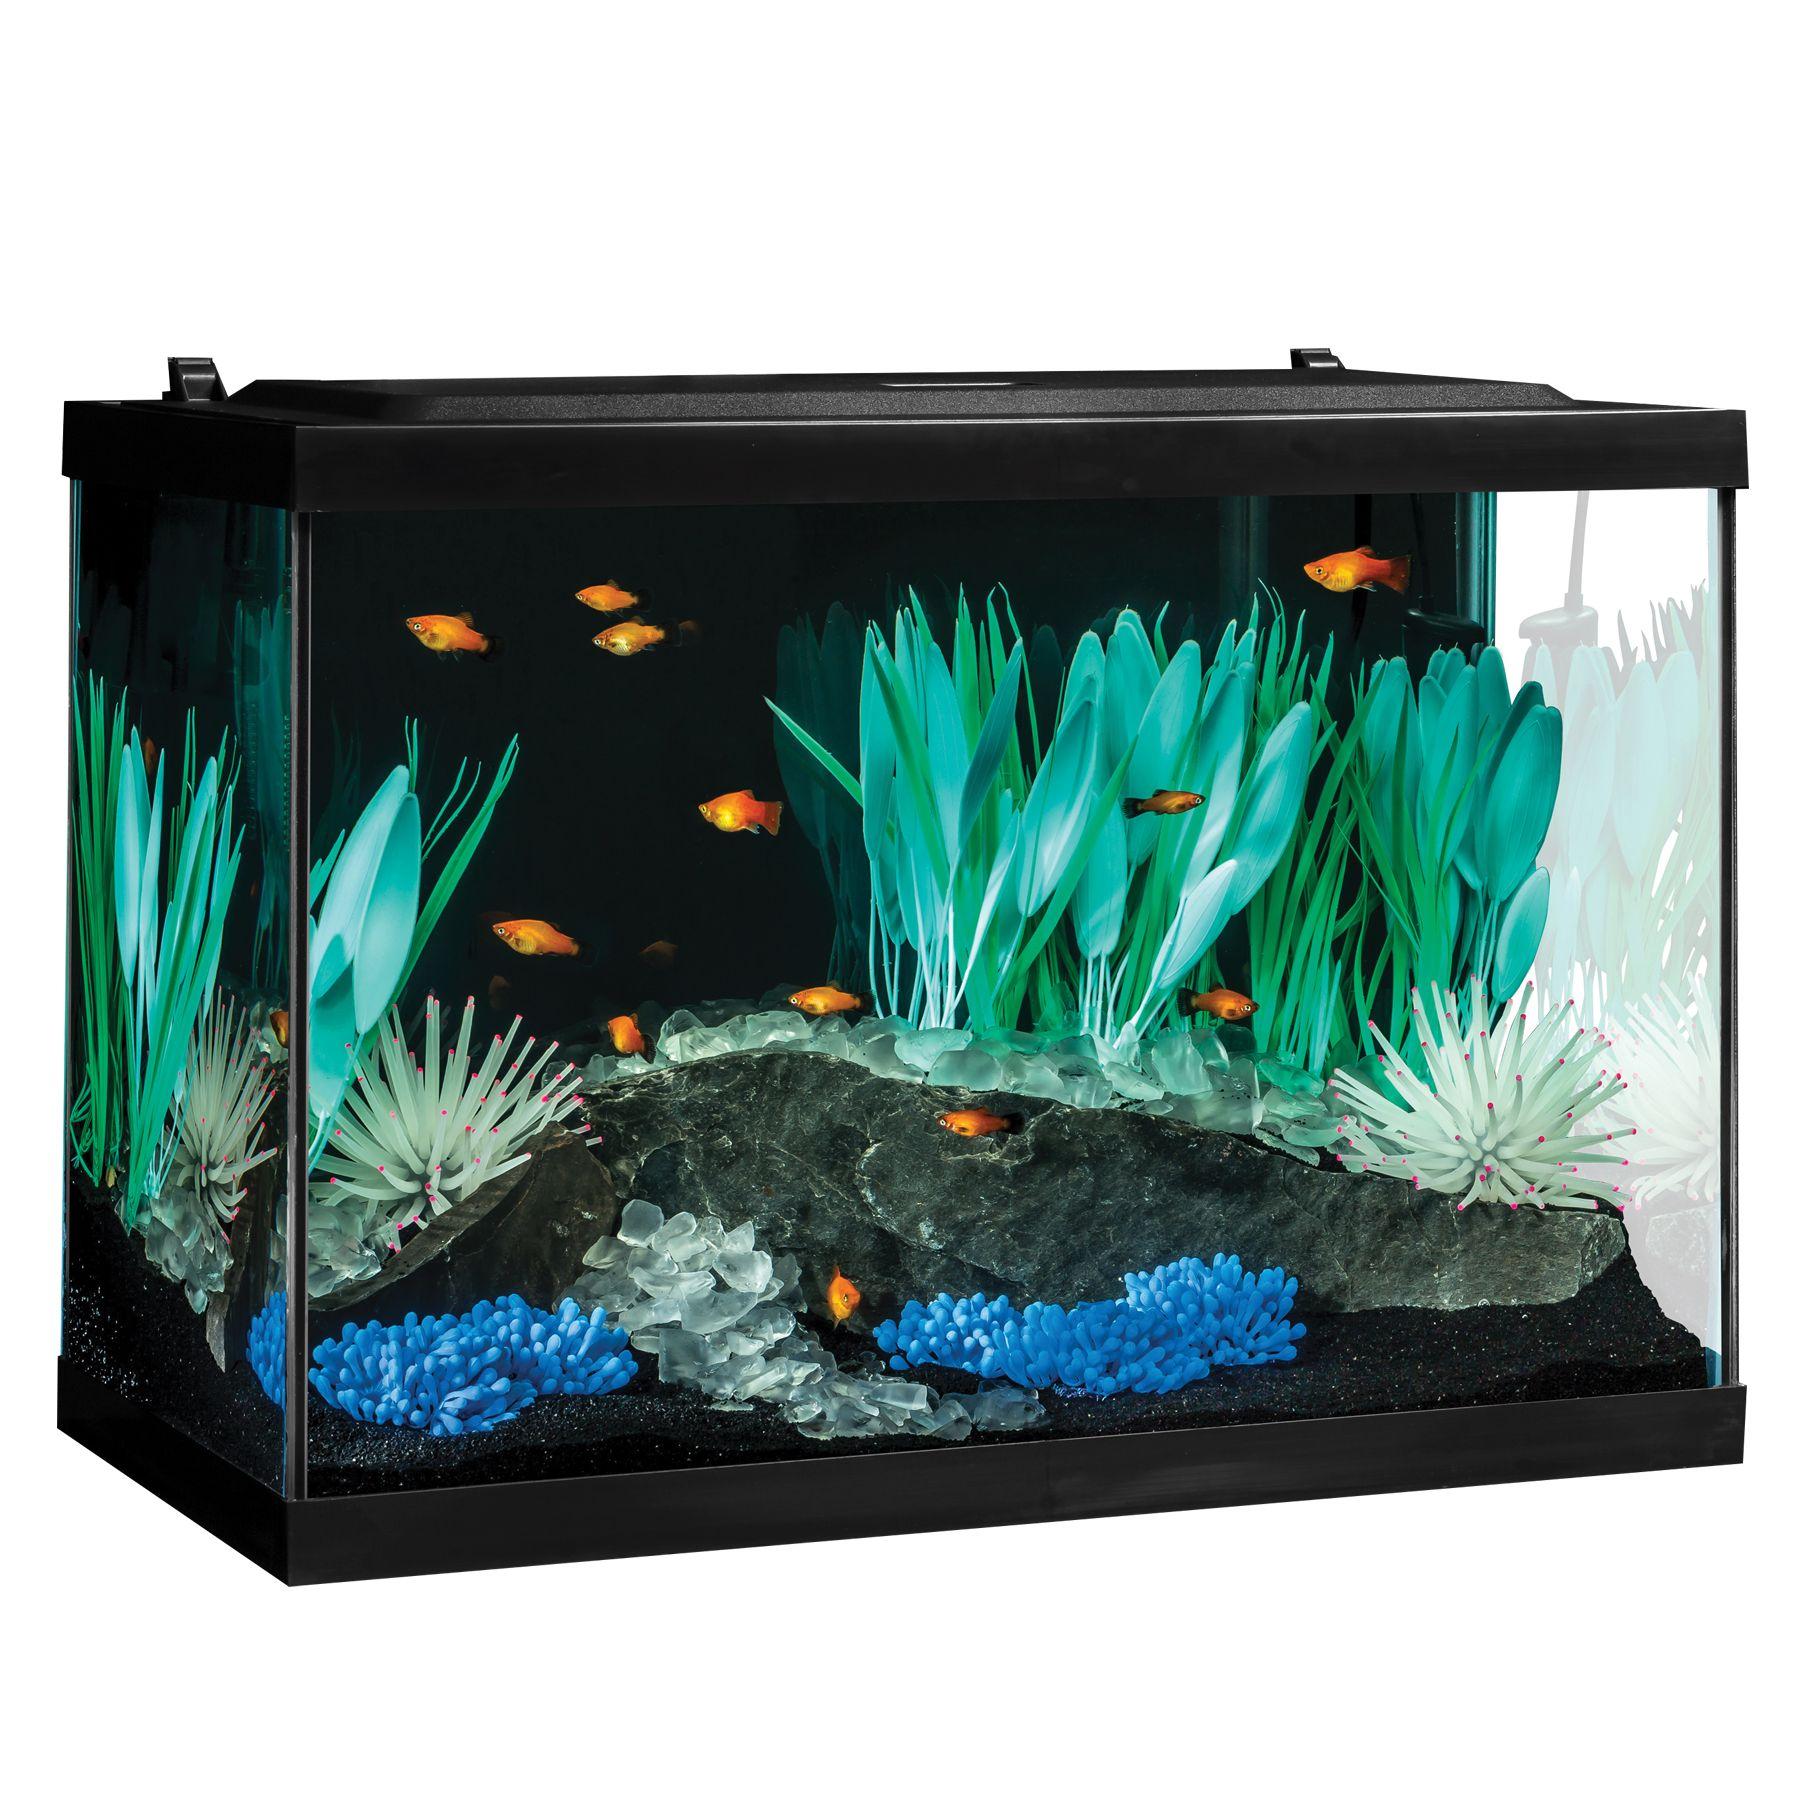 10 gallon aquarium stand white jbj 20 gallon aquarium for 10 gallon fish tank size